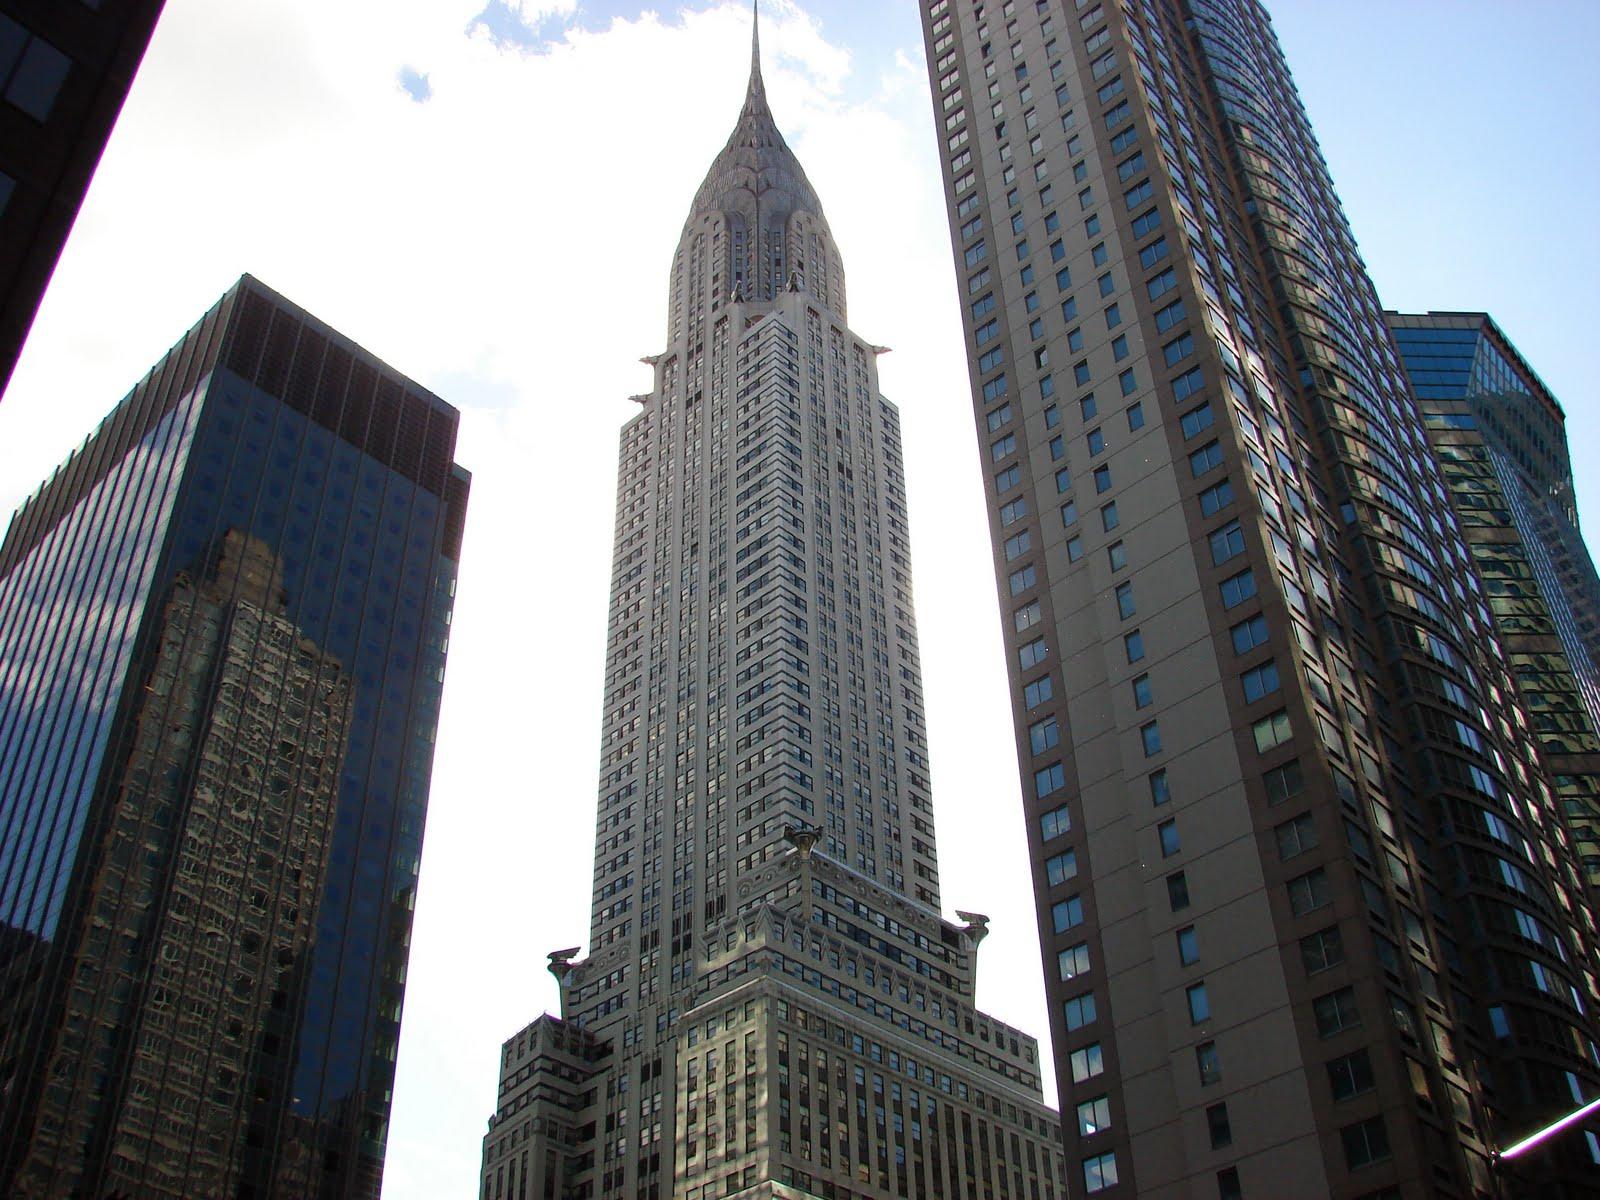 Chrysler Building Wikipedia: An Architectural Pilgrimage: Chrysler Building